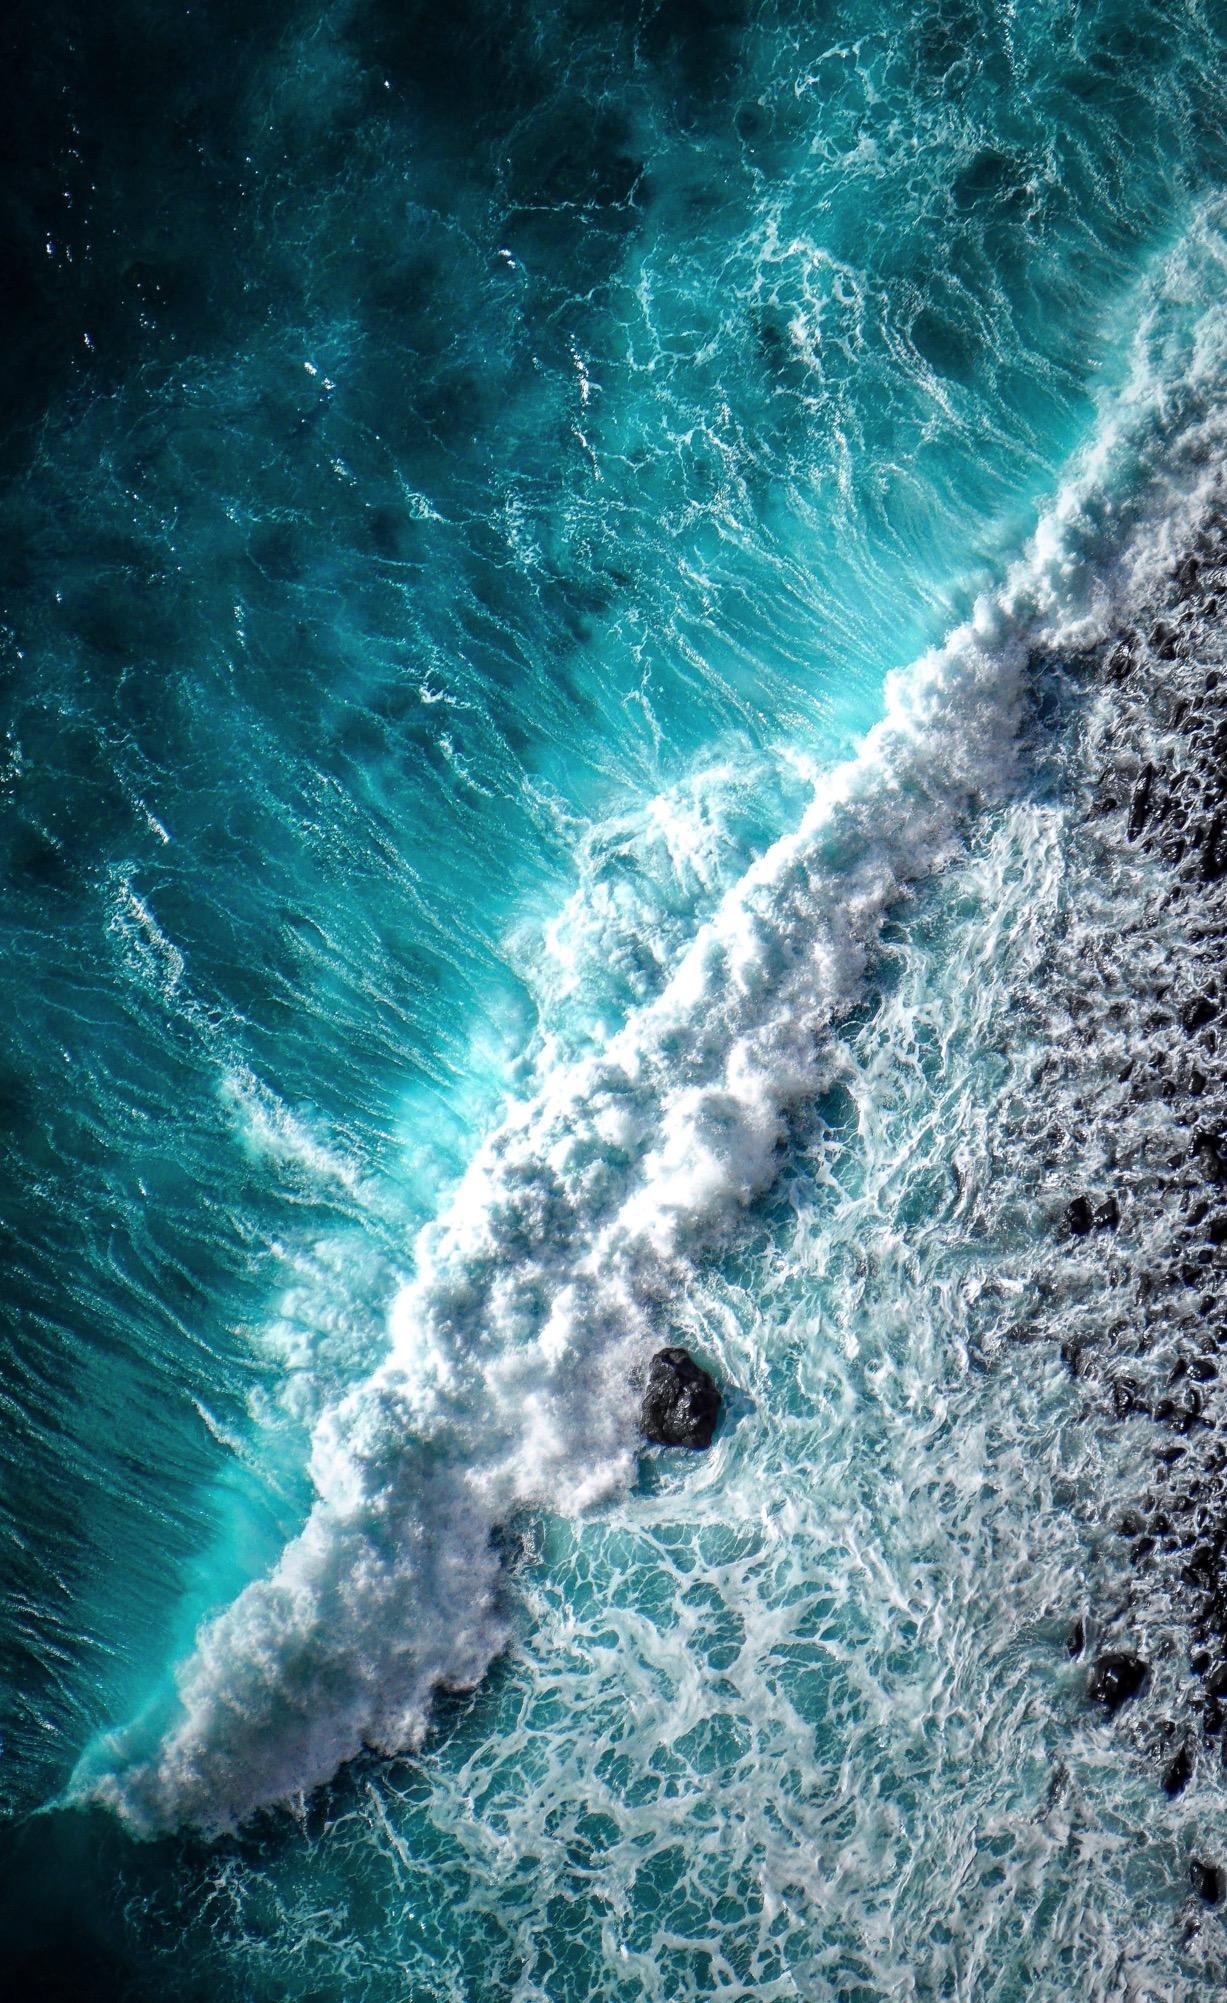 Aerial image of a wave crashing